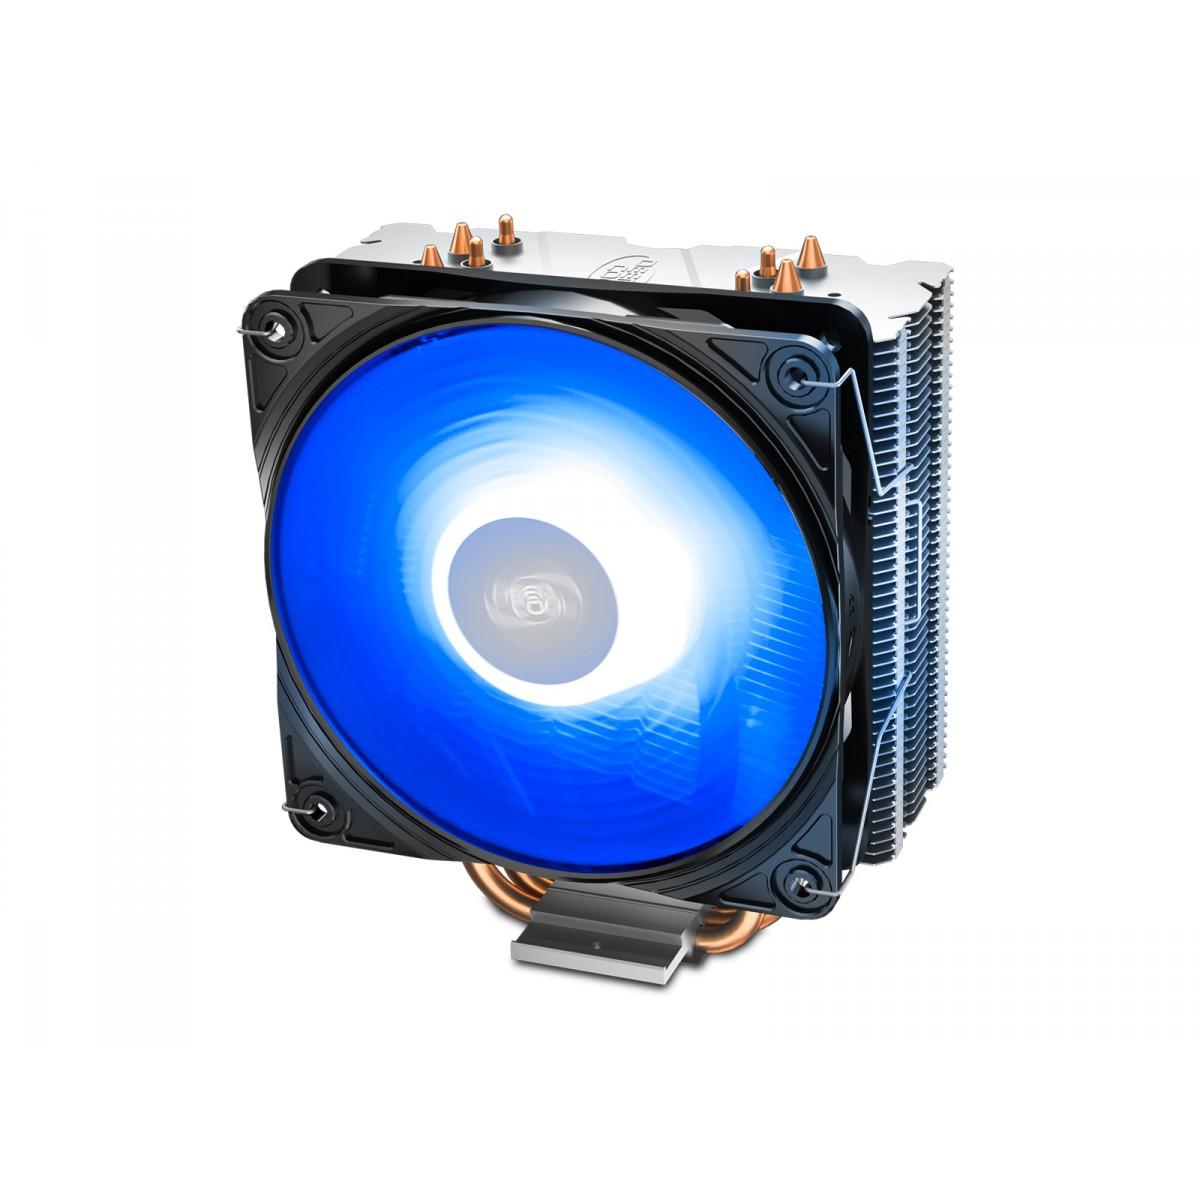 Cooler para Processador DeepCool Gammaxx 400 V2 Blue, 120mm, Intel-AMD, DP-MCH4-GMX400V2-BL